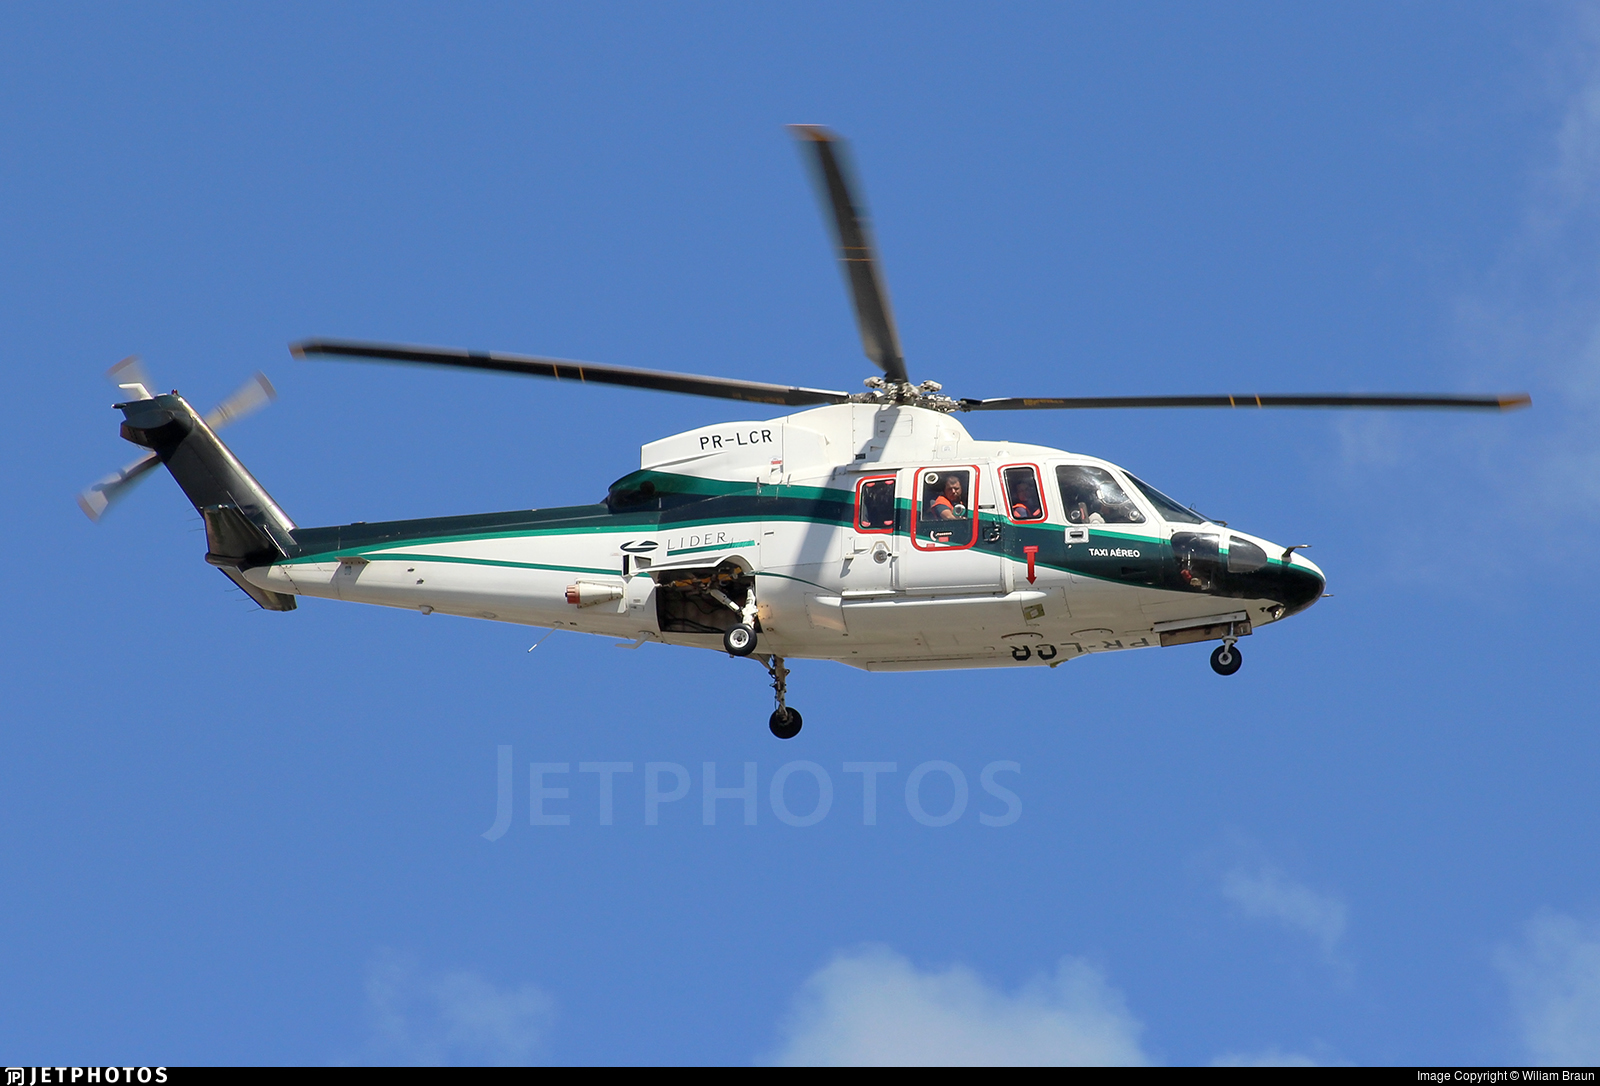 PR-LCR - Sikorsky S-76C - Líder Táxi Aéreo